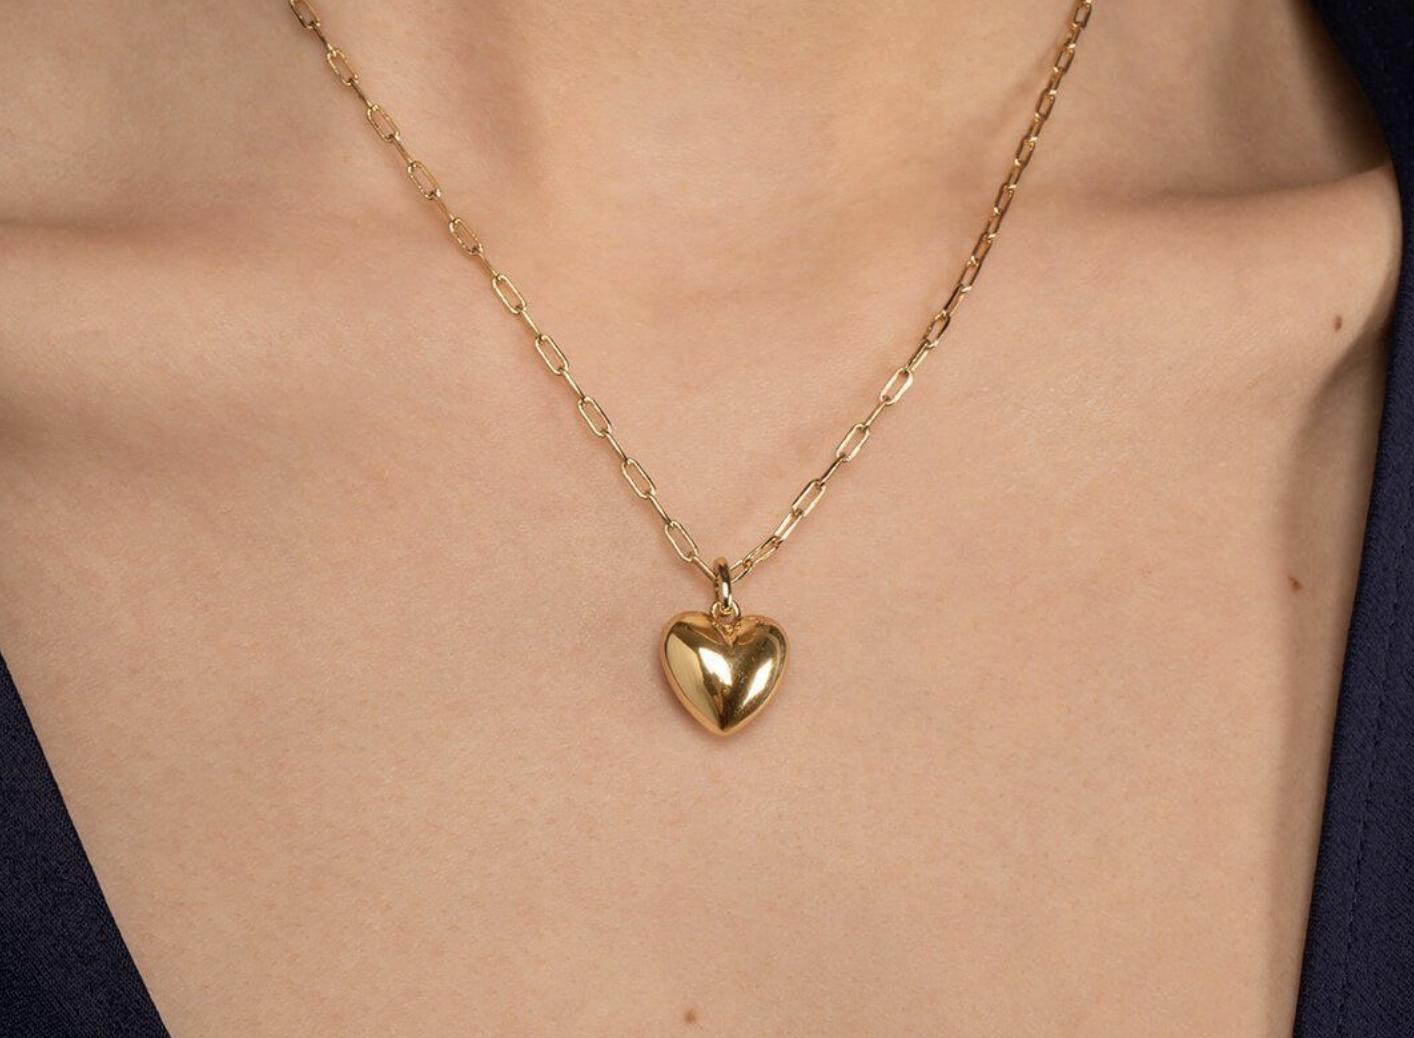 woman wearing gold pendant